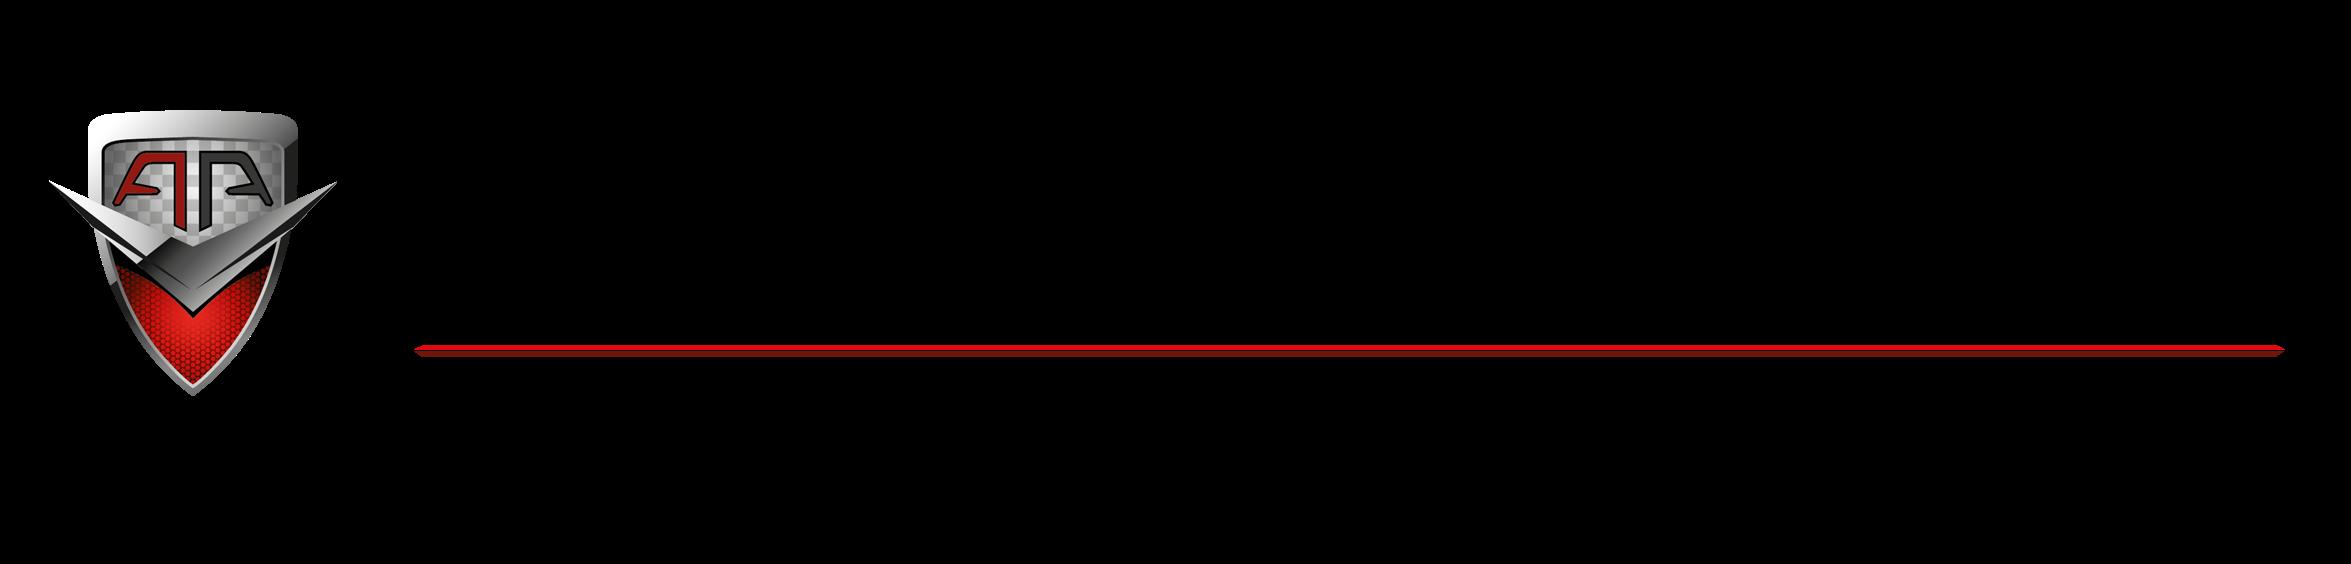 Logo Arrinera